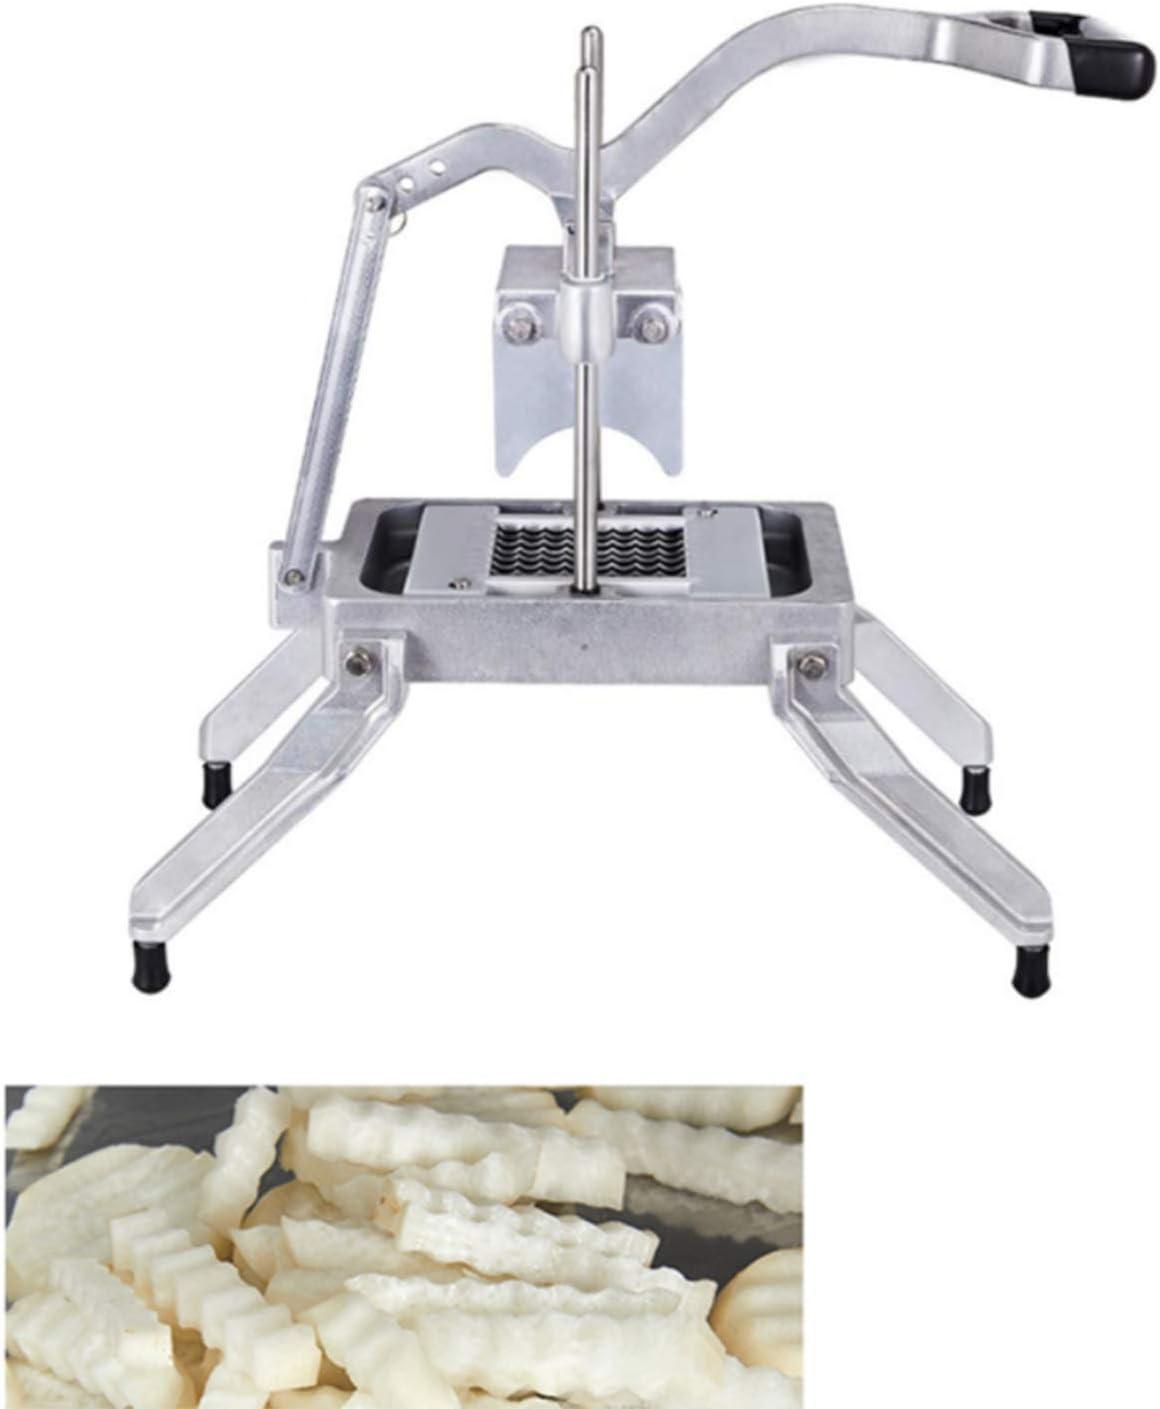 Our shop most popular Max 84% OFF YUYAO Manual Potato Machine Slicing Cutting